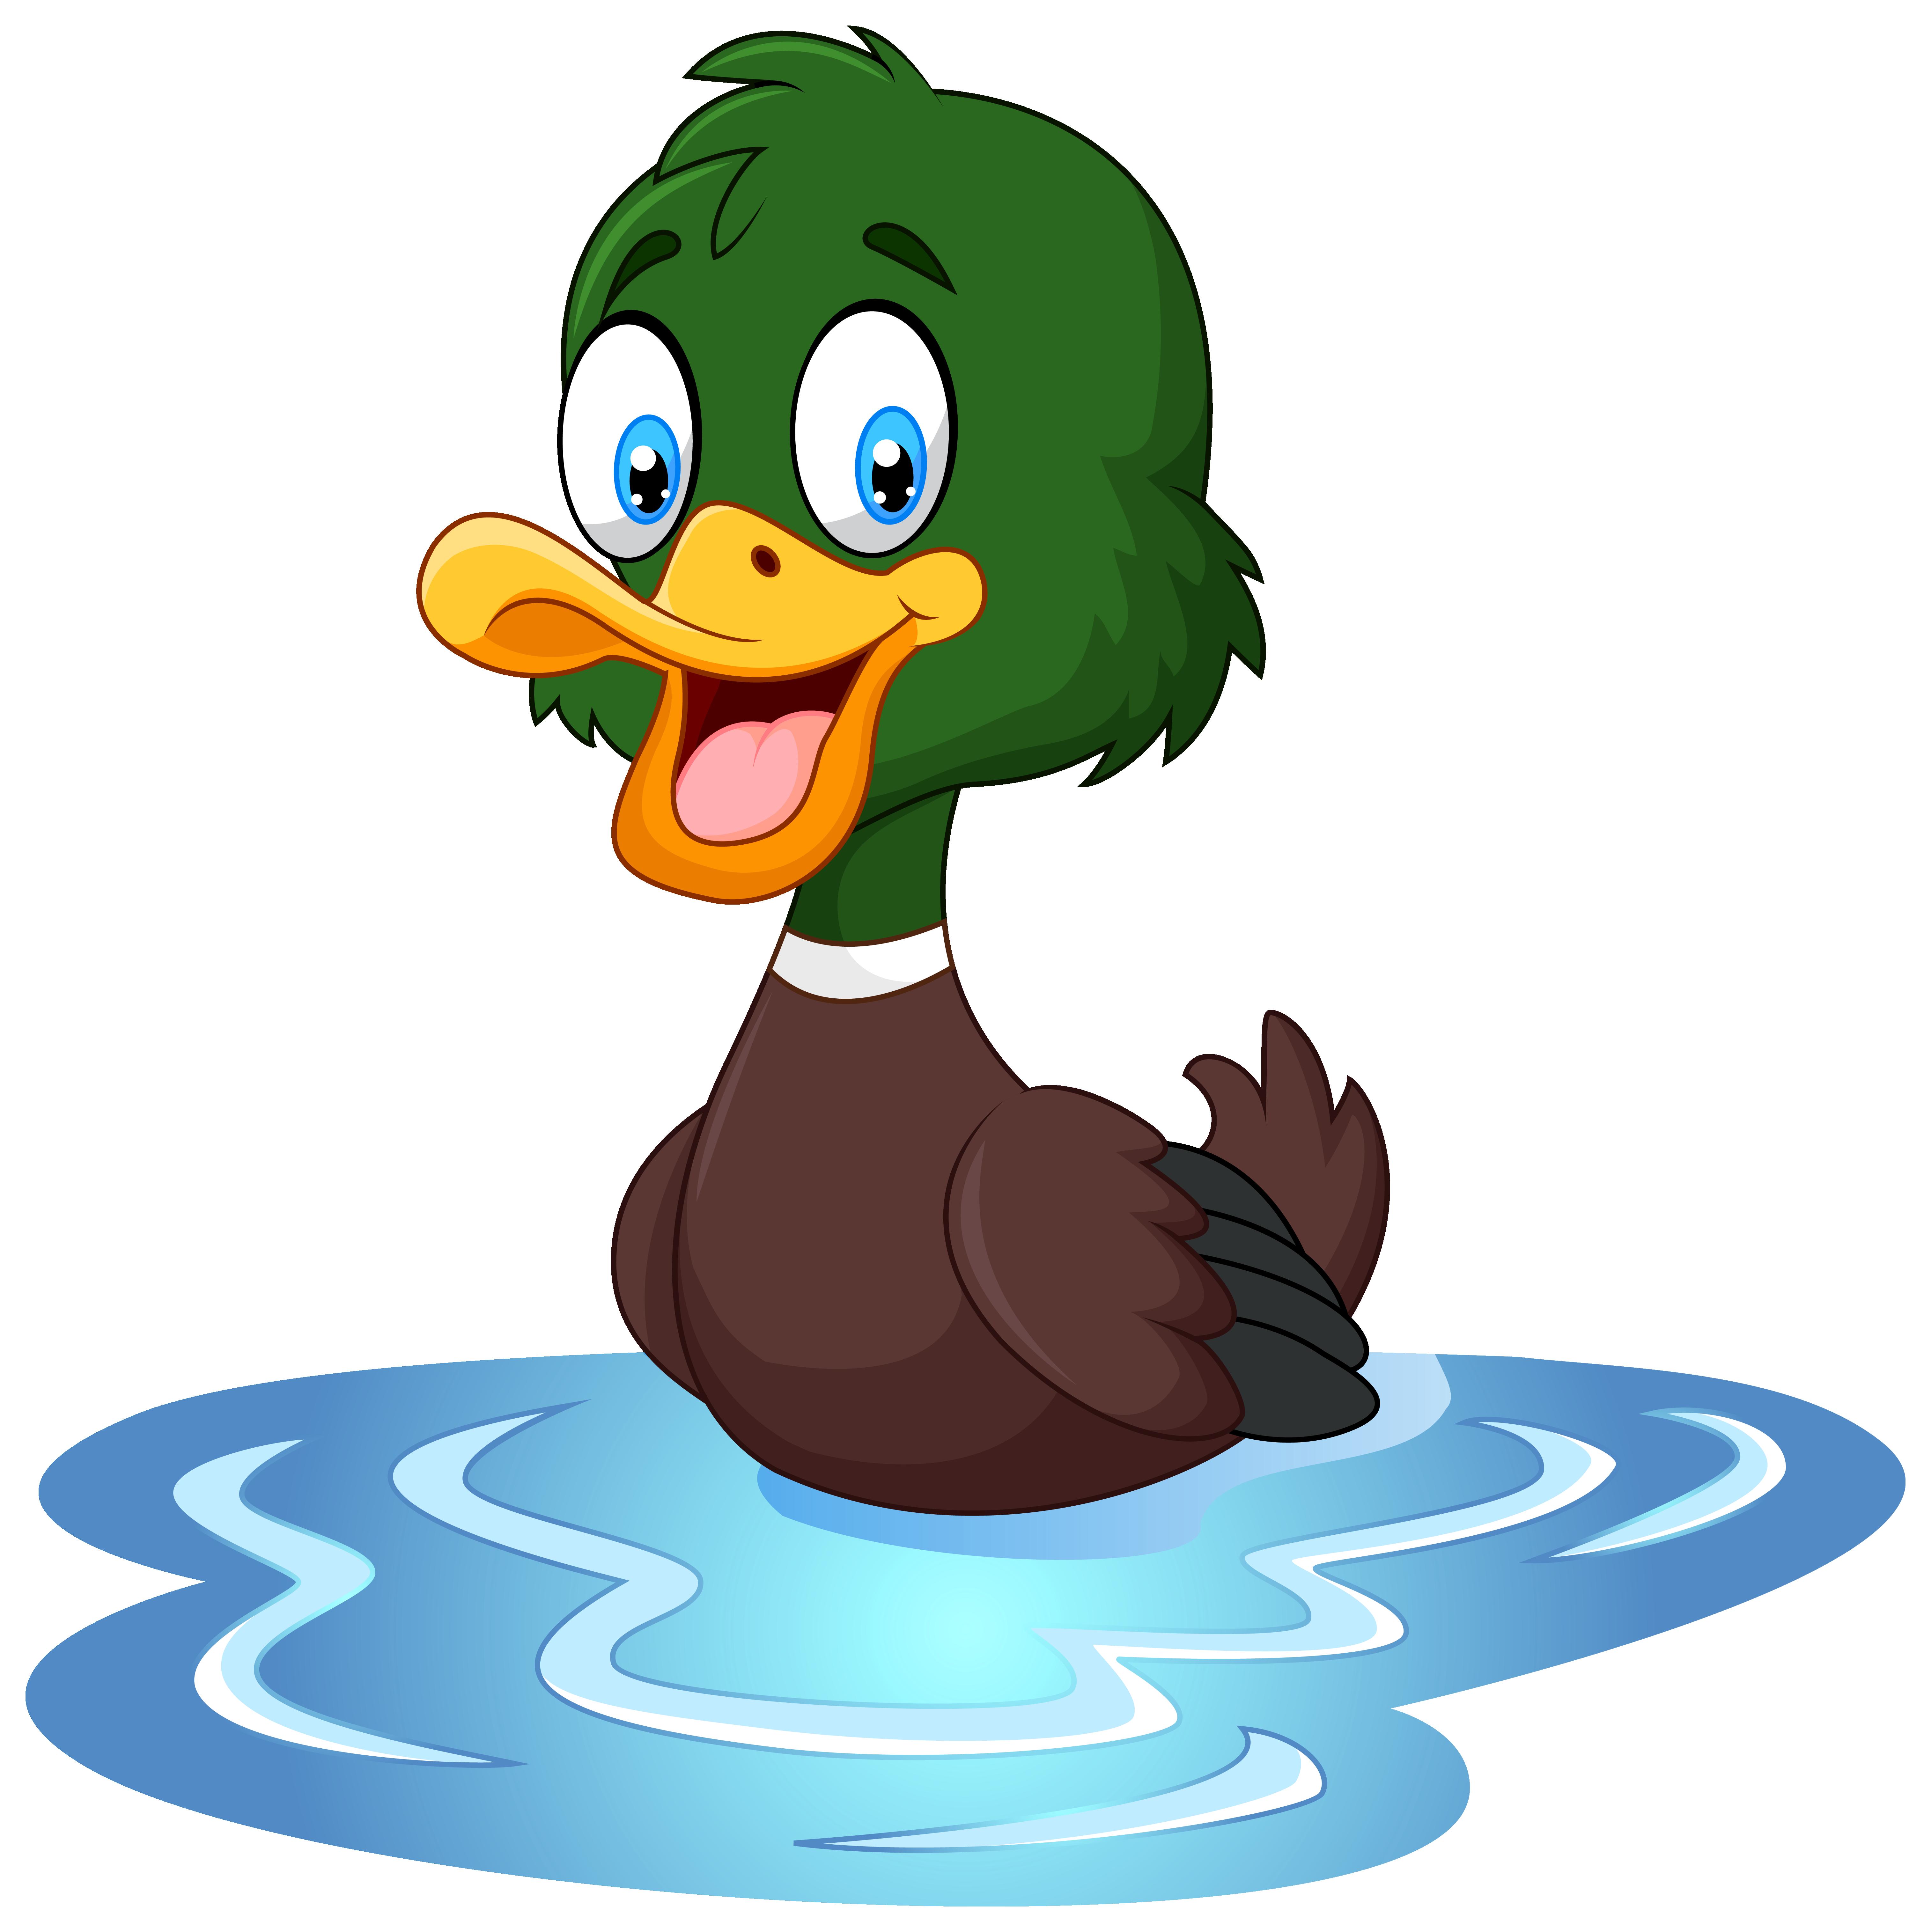 Duck clip art image.